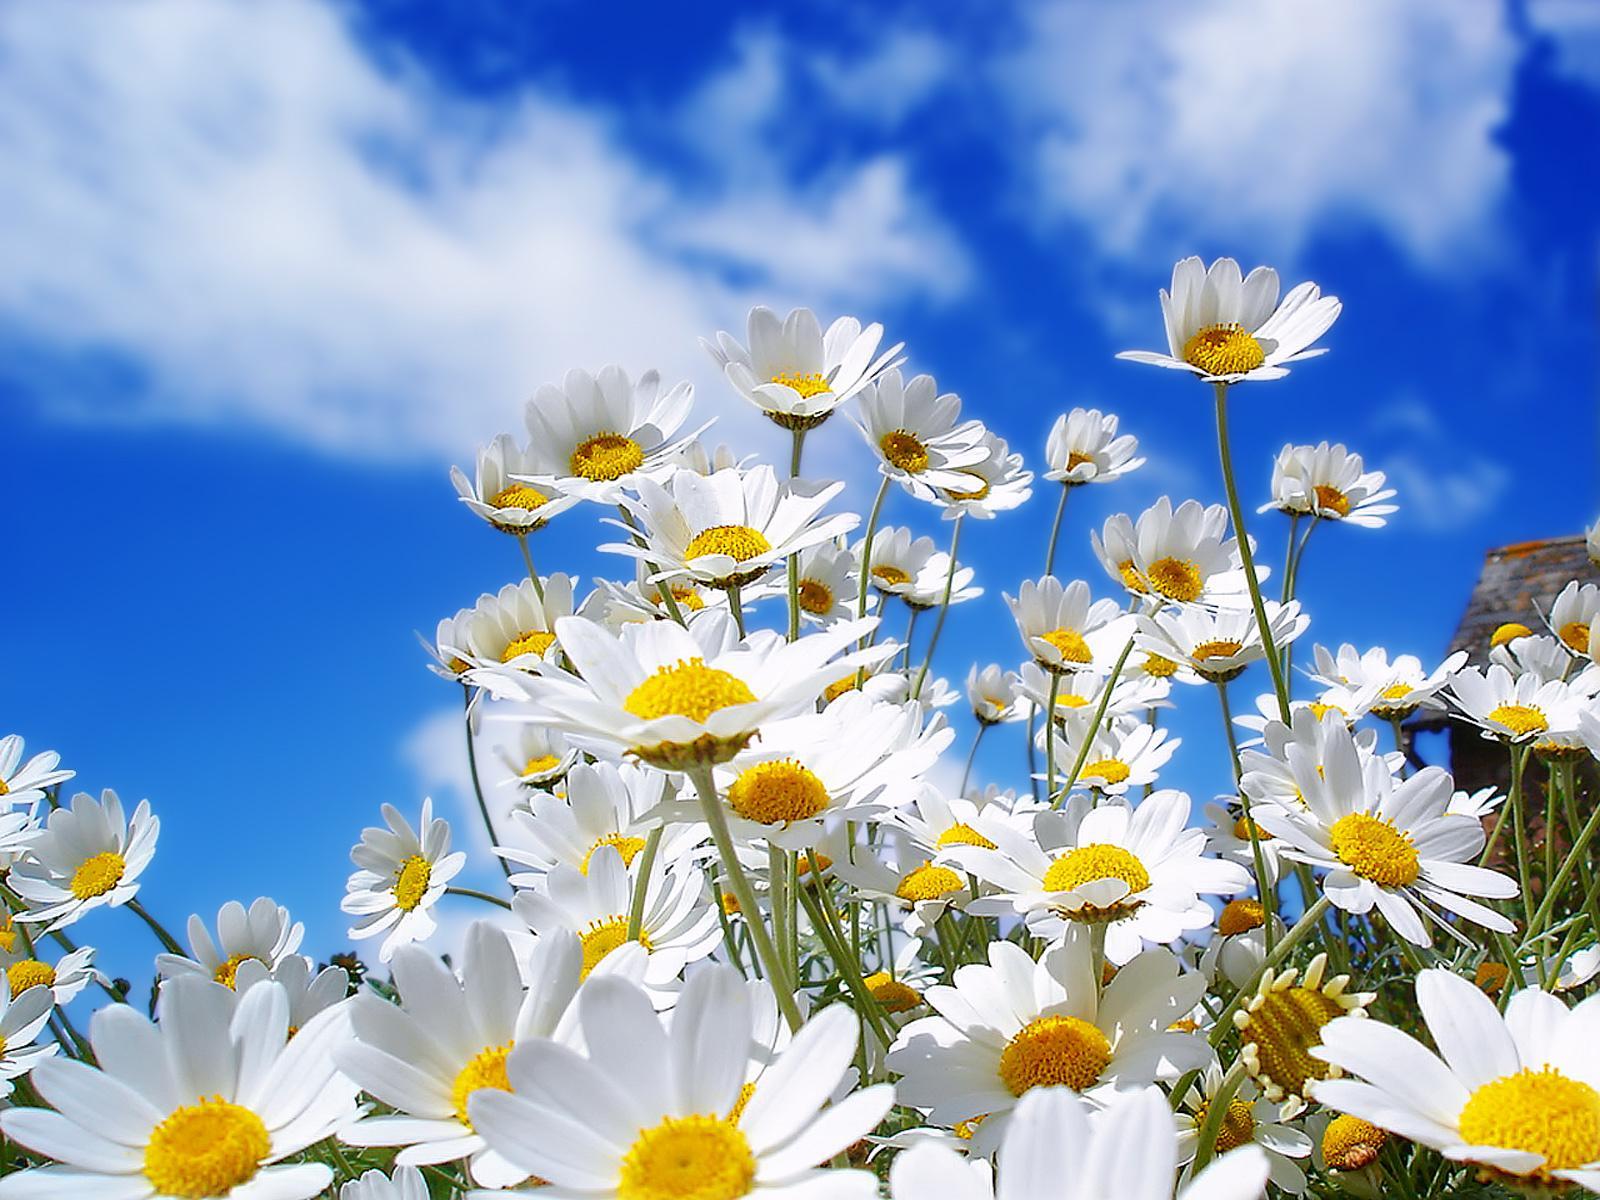 http://1.bp.blogspot.com/-MXaTETKCOpM/Tc29xaFC6pI/AAAAAAAAAD0/67bxYlioomg/s1600/spring-wallpaper_flower_spring.jpg